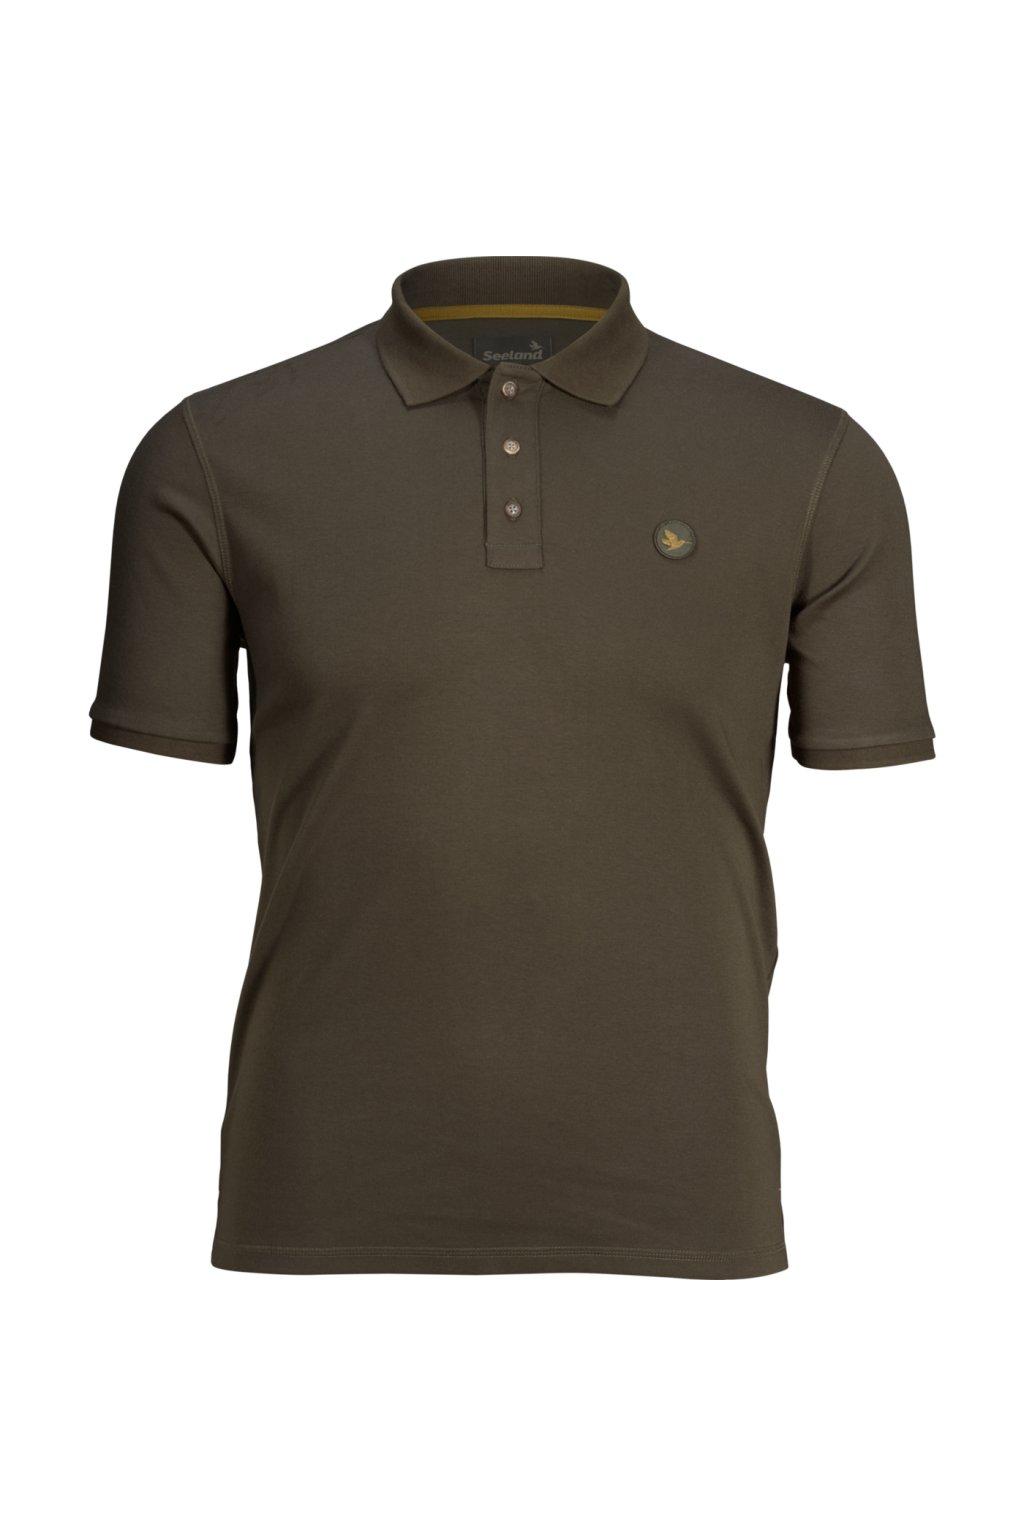 Seeland - Skeet Polo triko pánské Classic Green